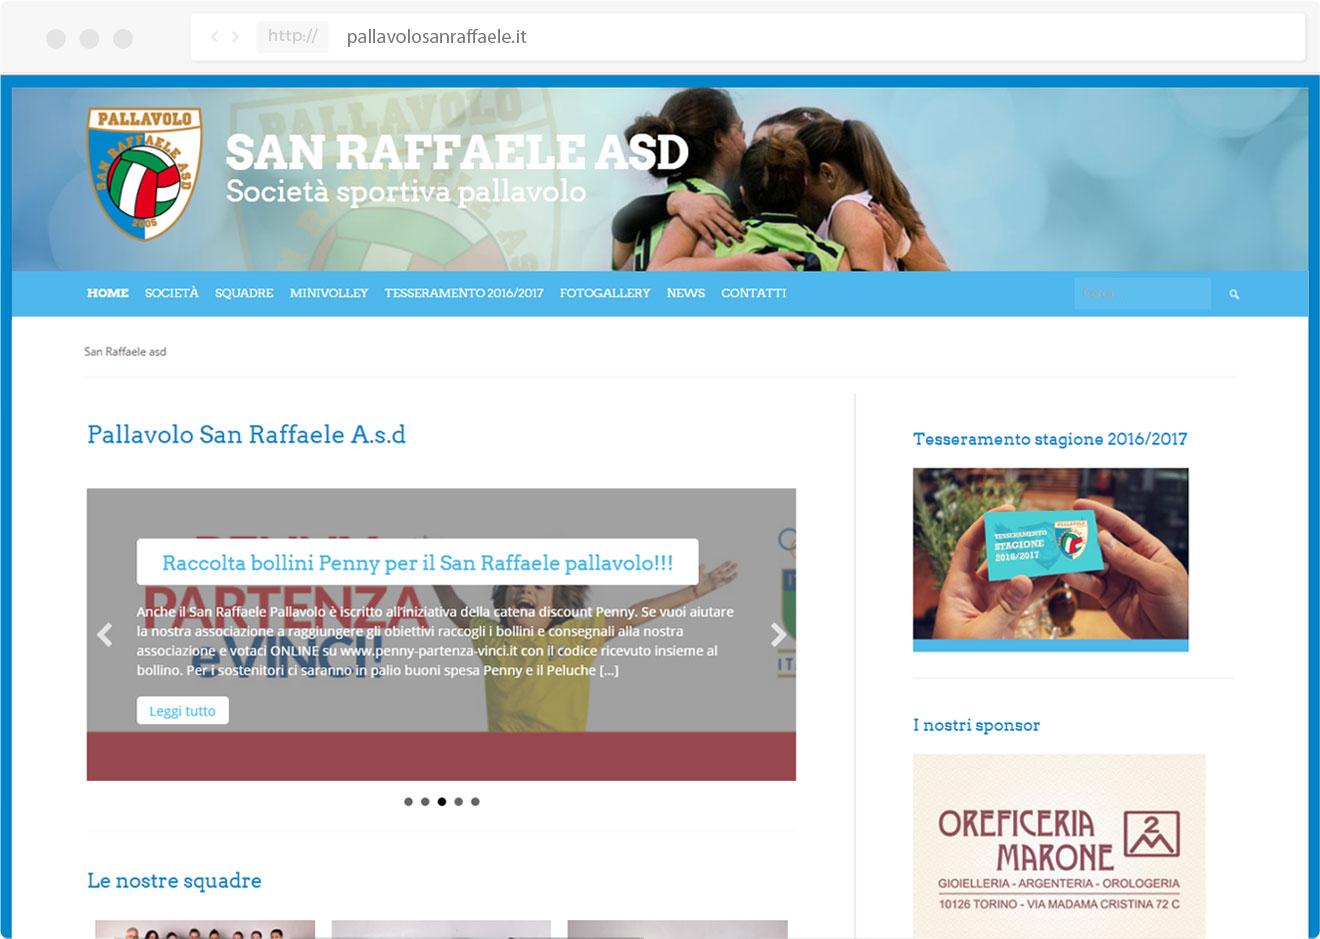 Pallavolo san raffaele- Tre W siti web